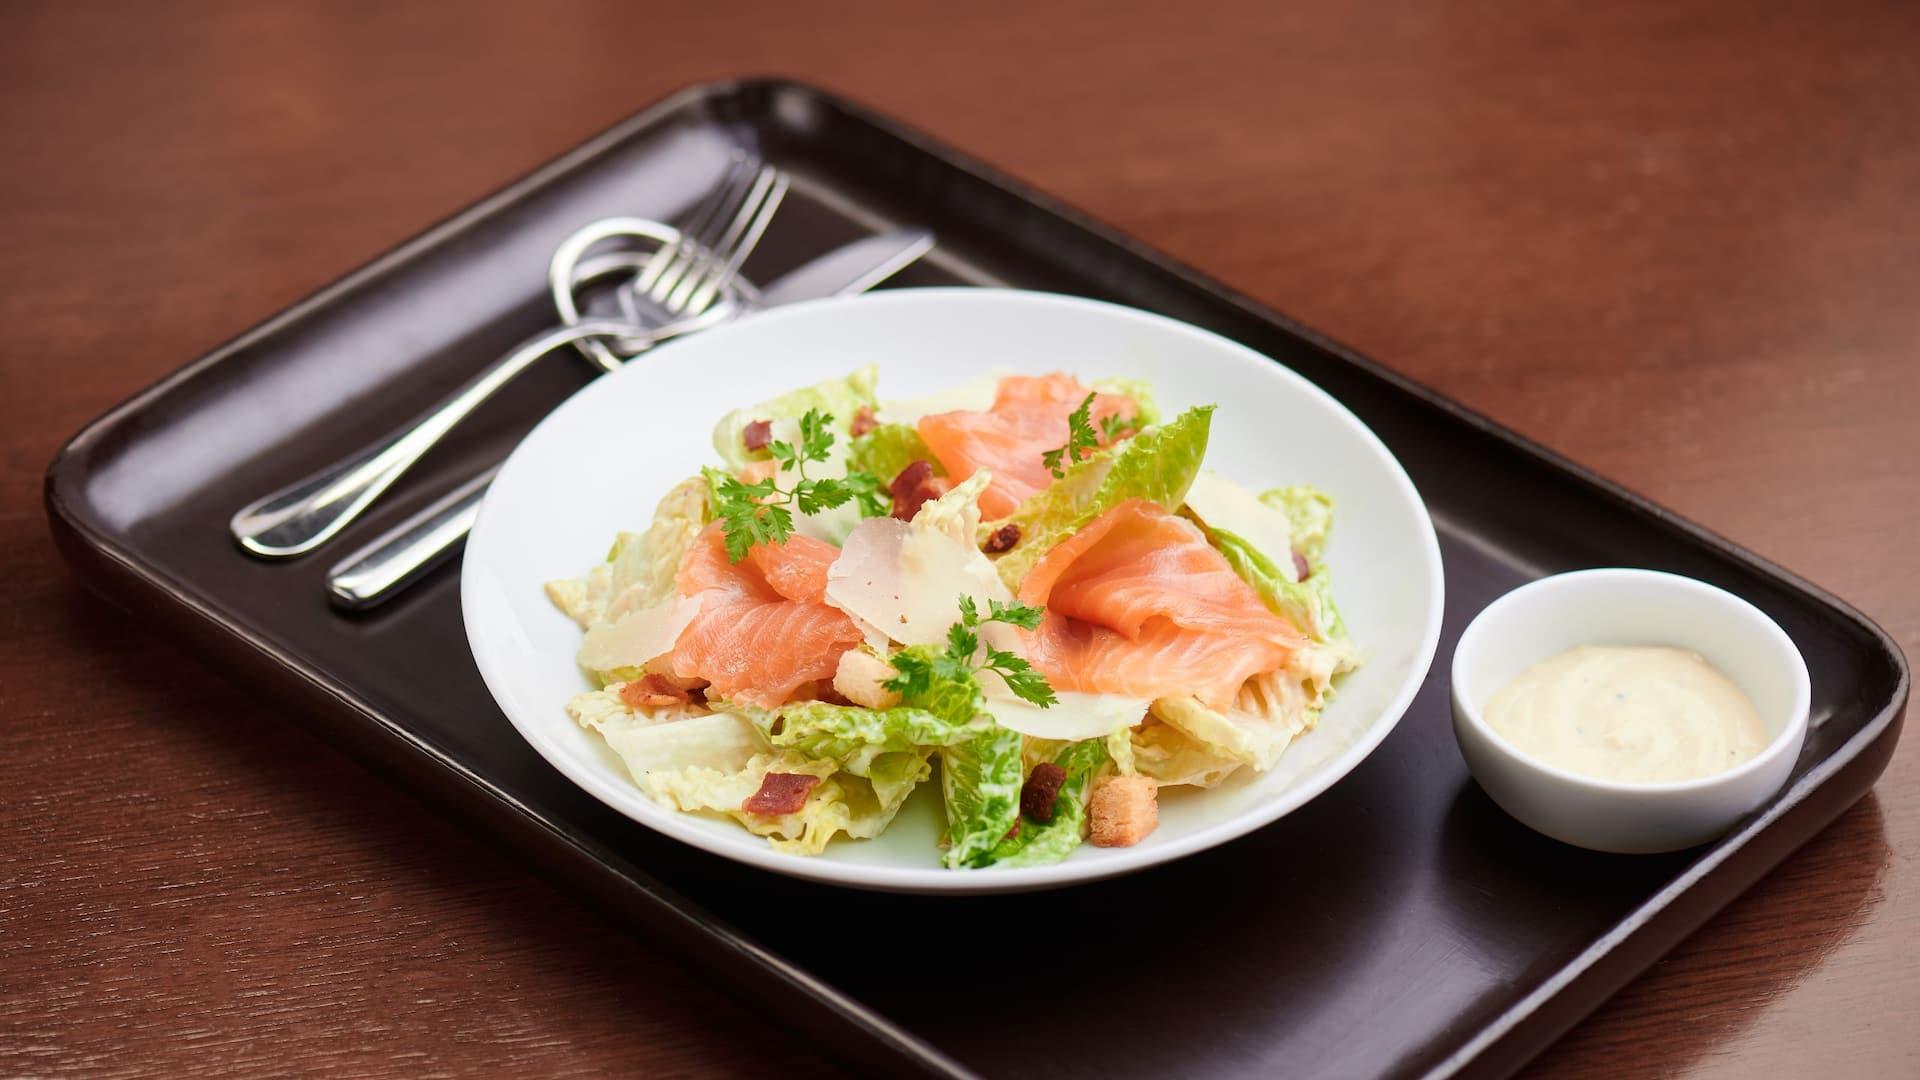 Cafe Caesar Salad